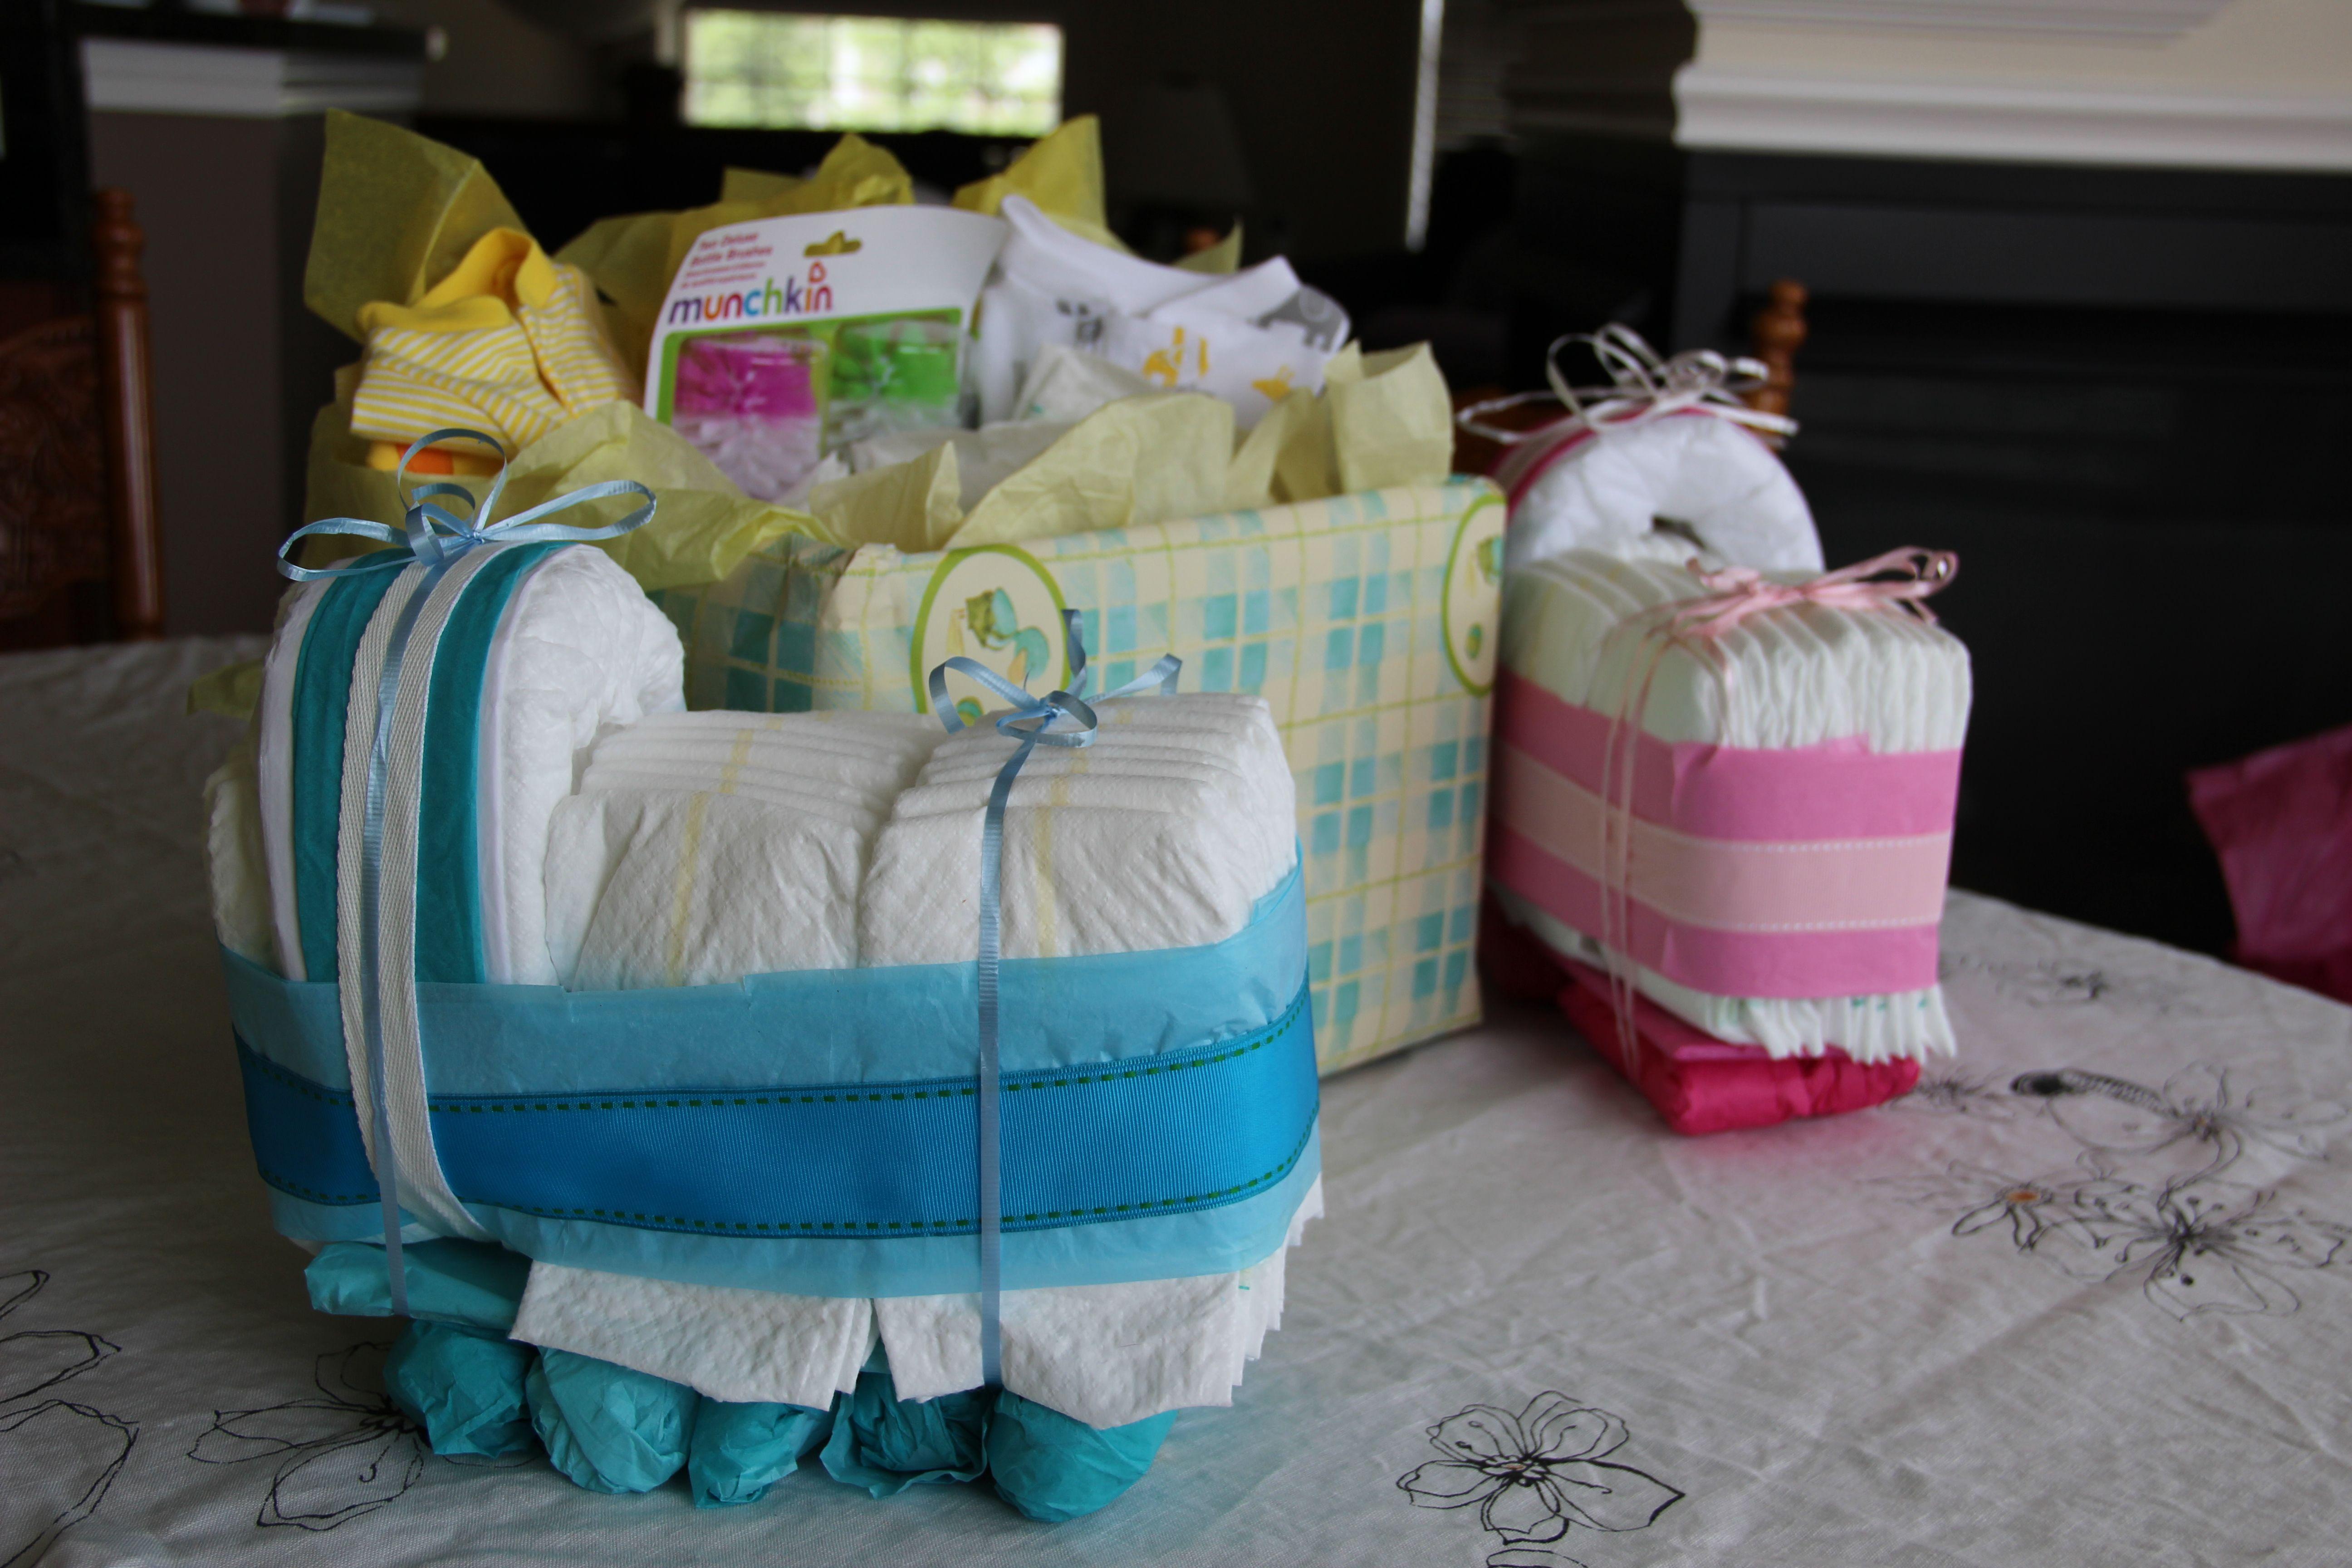 Got This Baby Shower Gift Idea From Pinterest Description Theimportanceofbeingcleveland WordPress